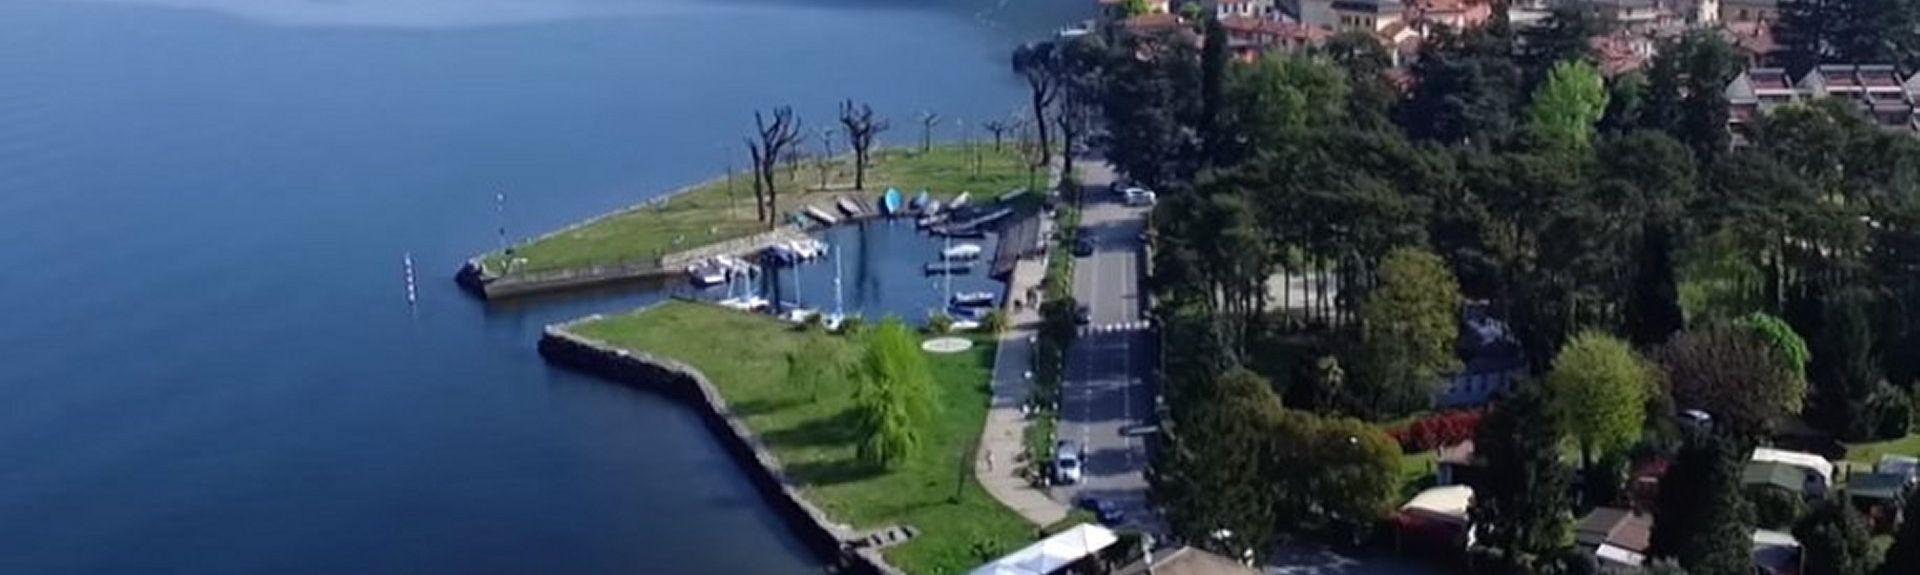 Parco Suardi, Bergamo, Lombardia, Italia